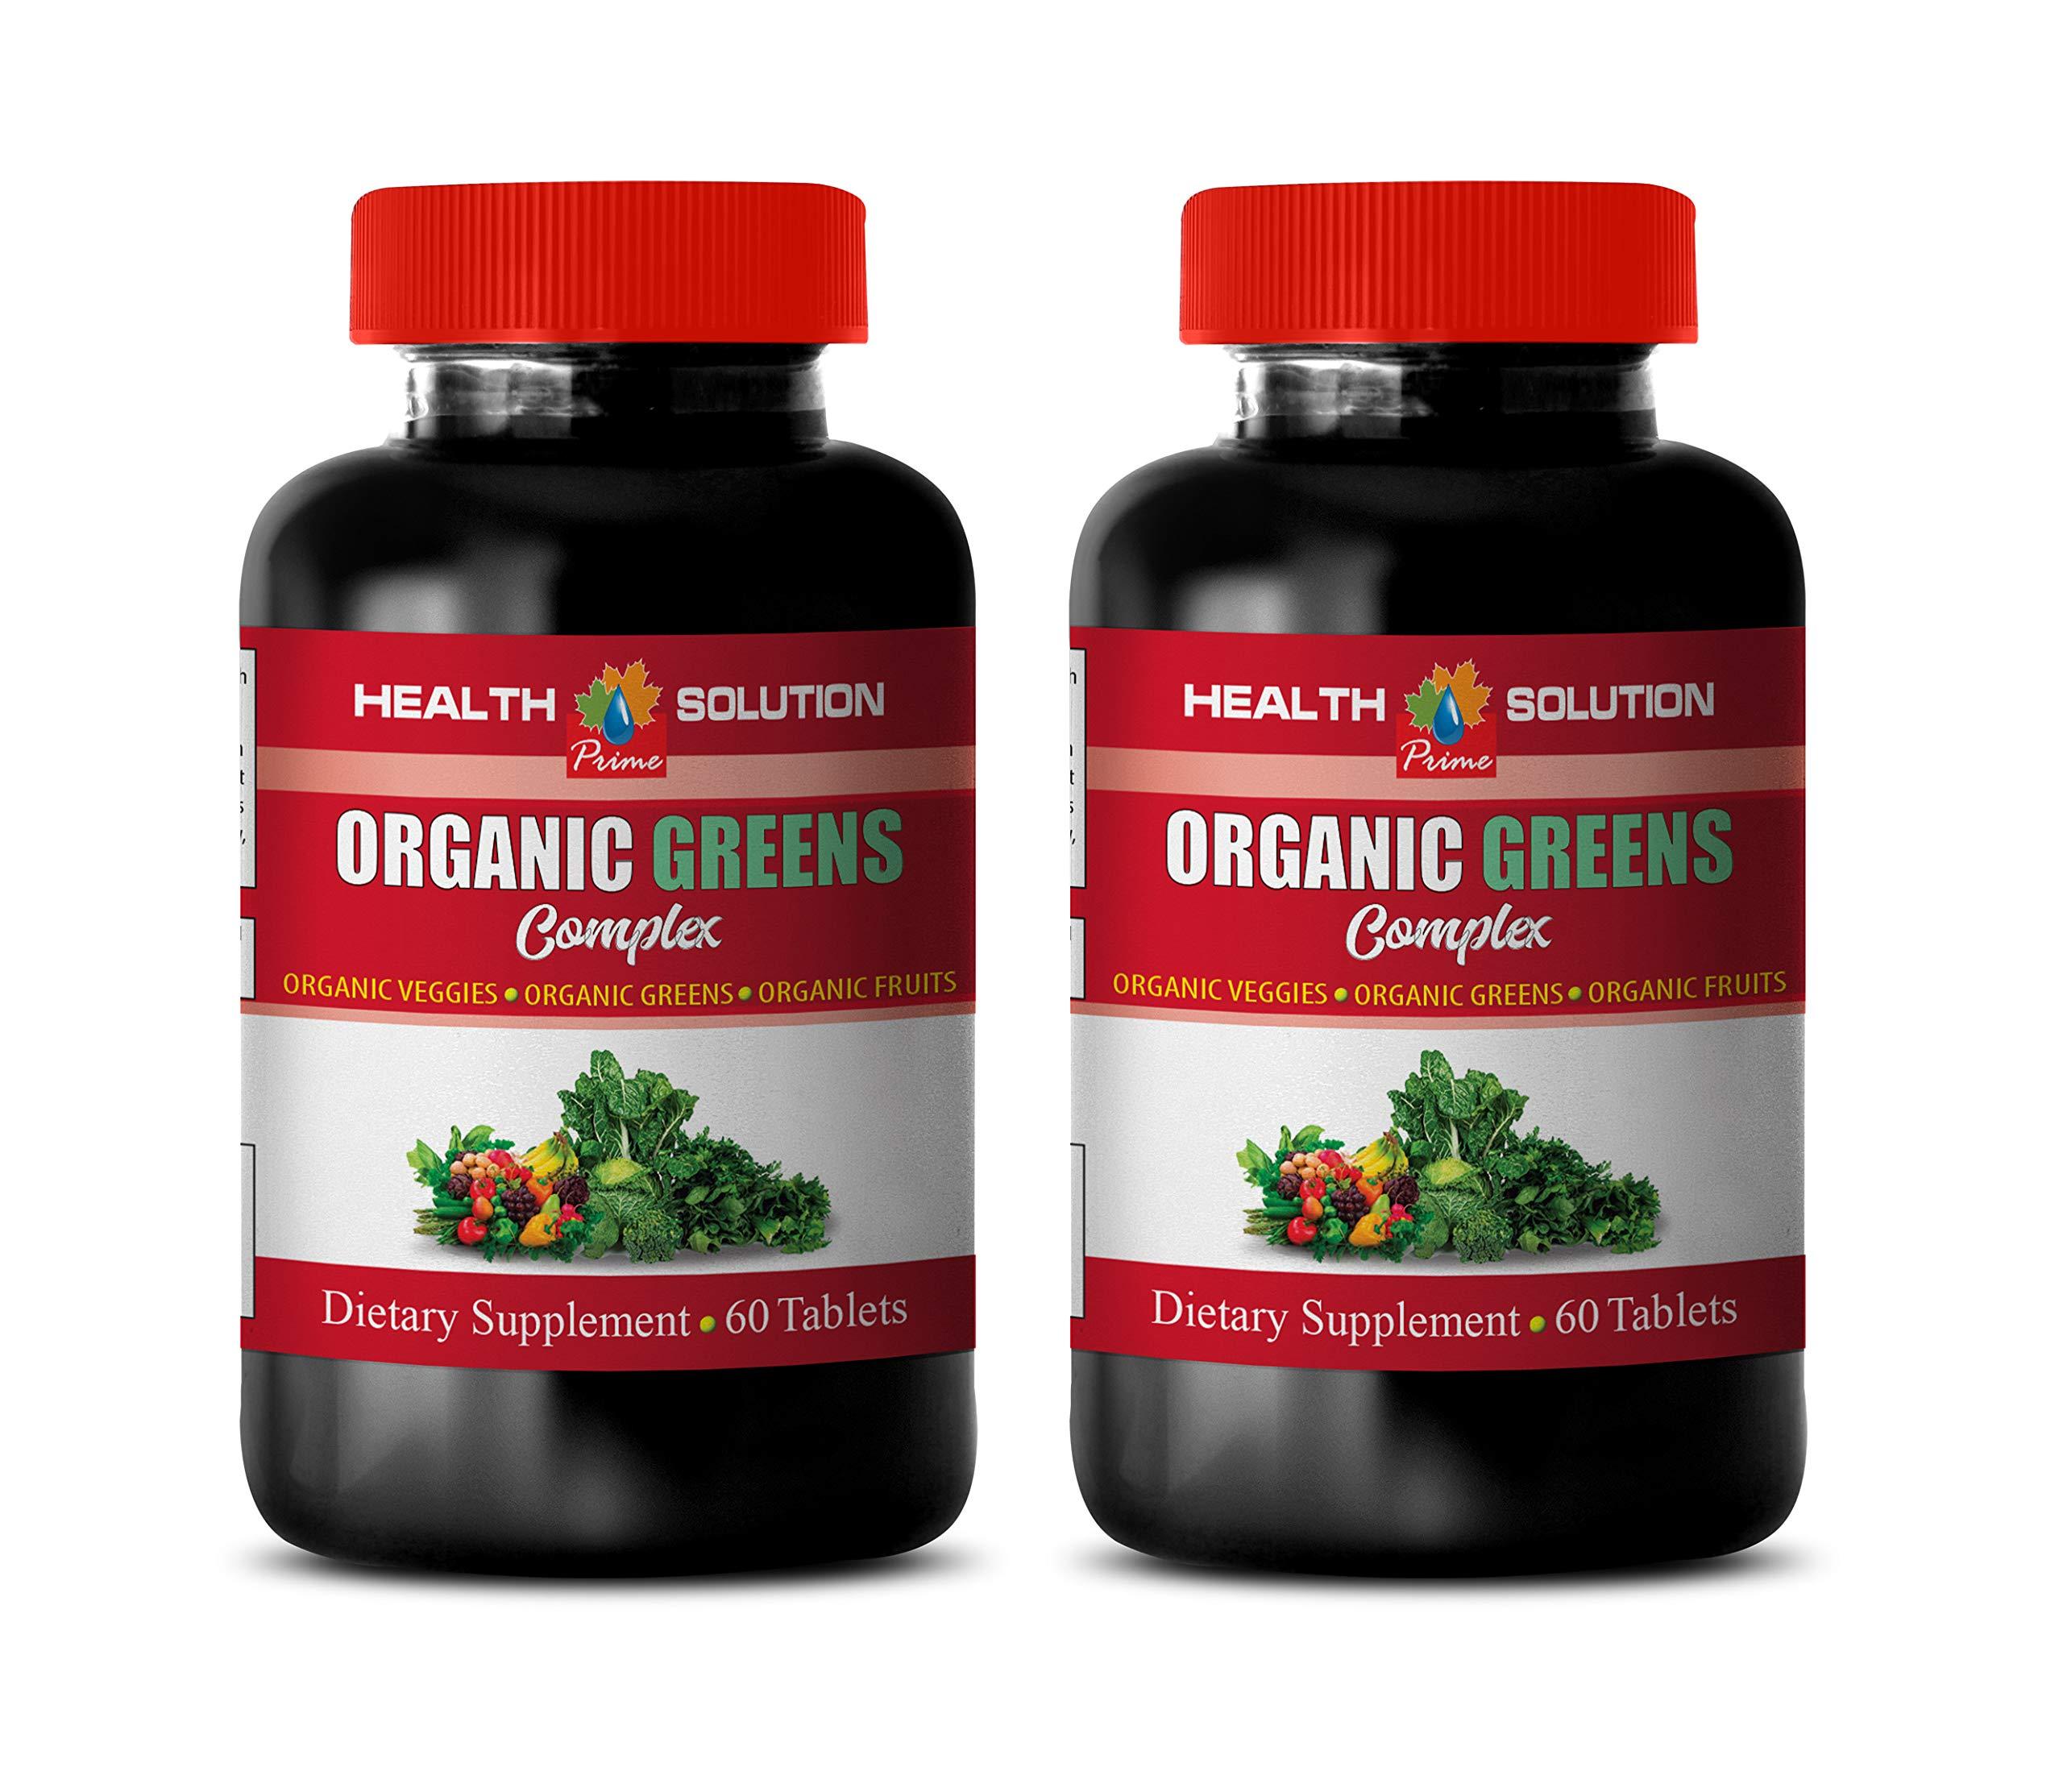 antioxidant Supplement Organic - Greens Organic Complex - Dietary Supplement - Strawberry Extract Organic - 2 Bottles 120 Tablets